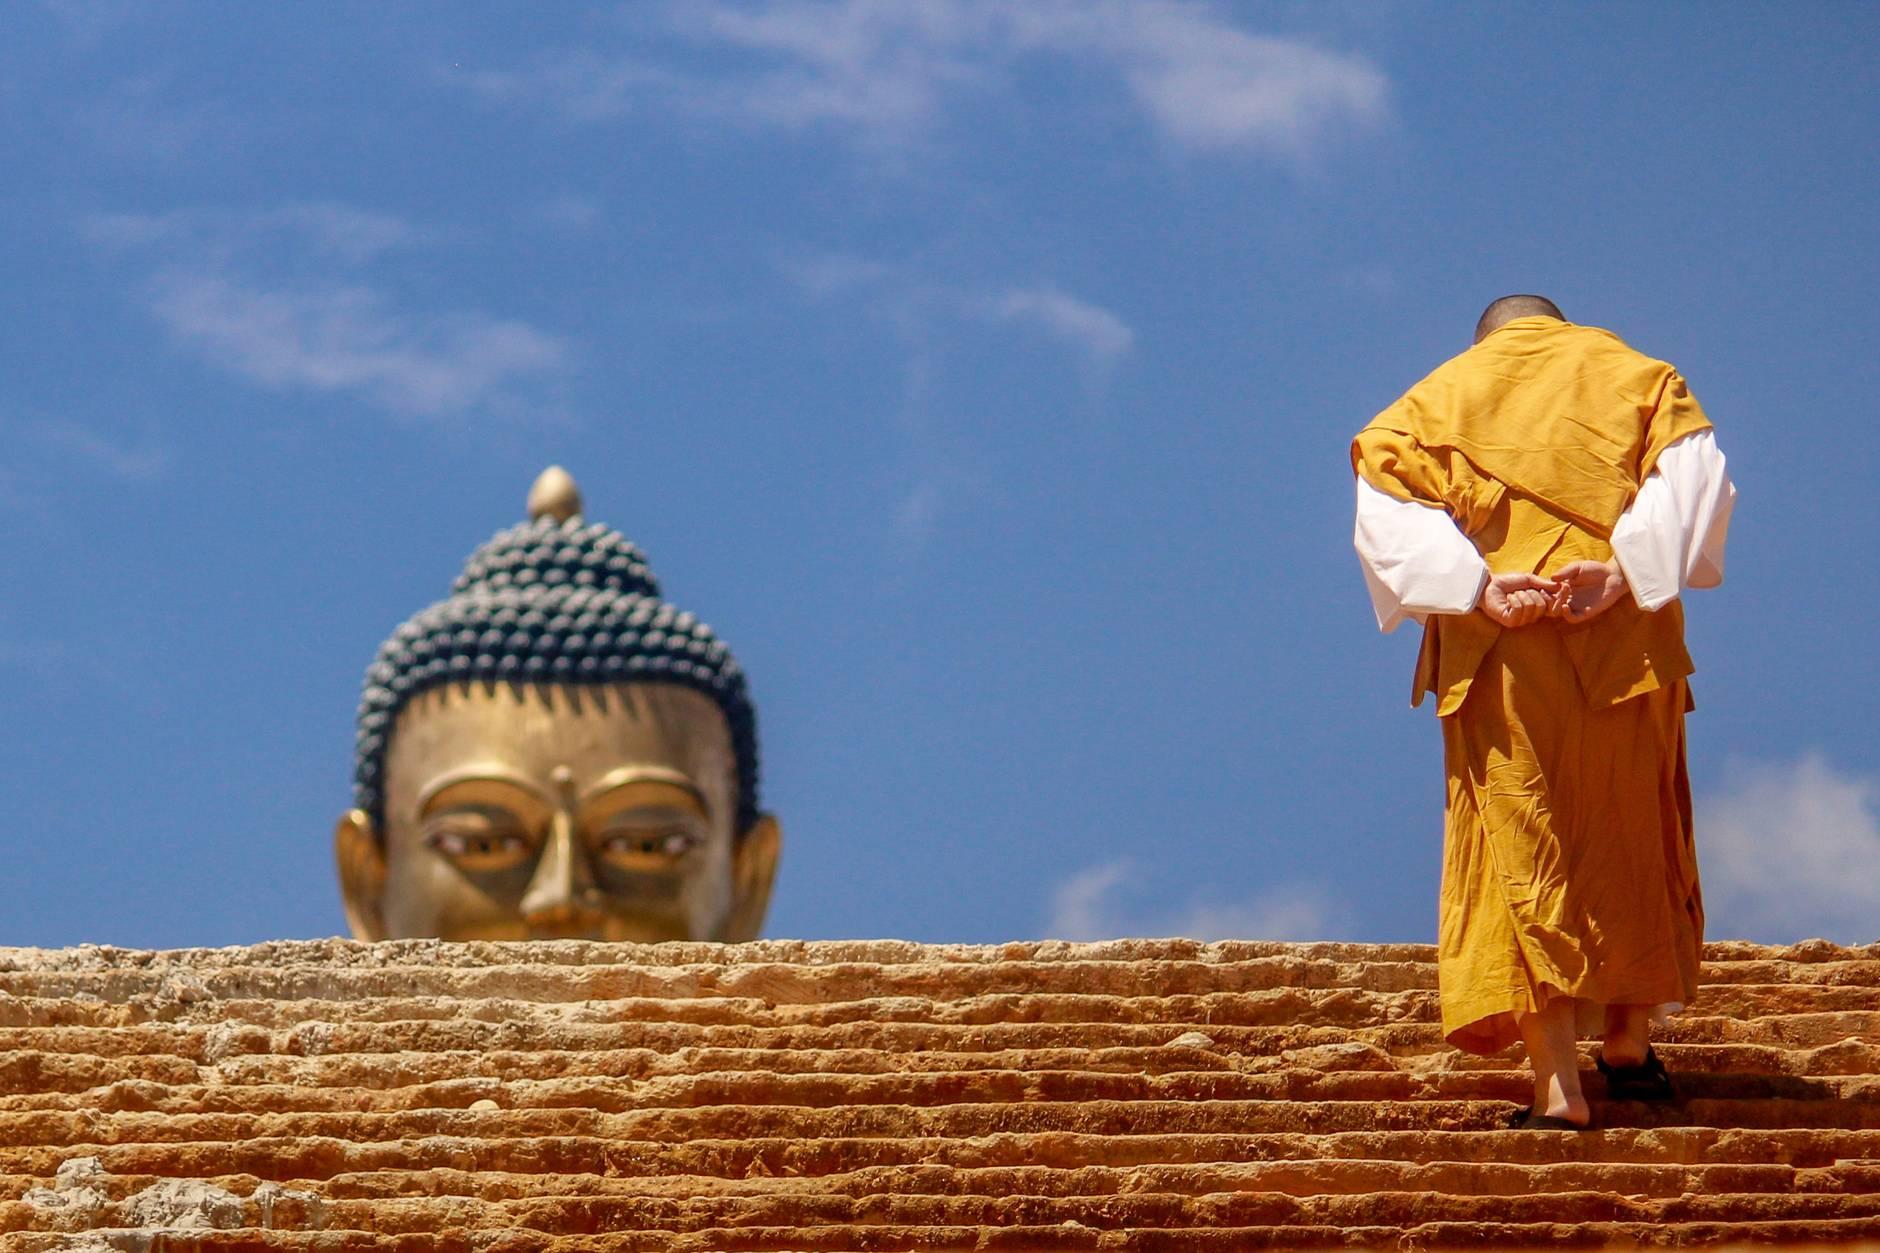 buddha, enlightenment, nirvana, boddhisatva, free from the subtle body